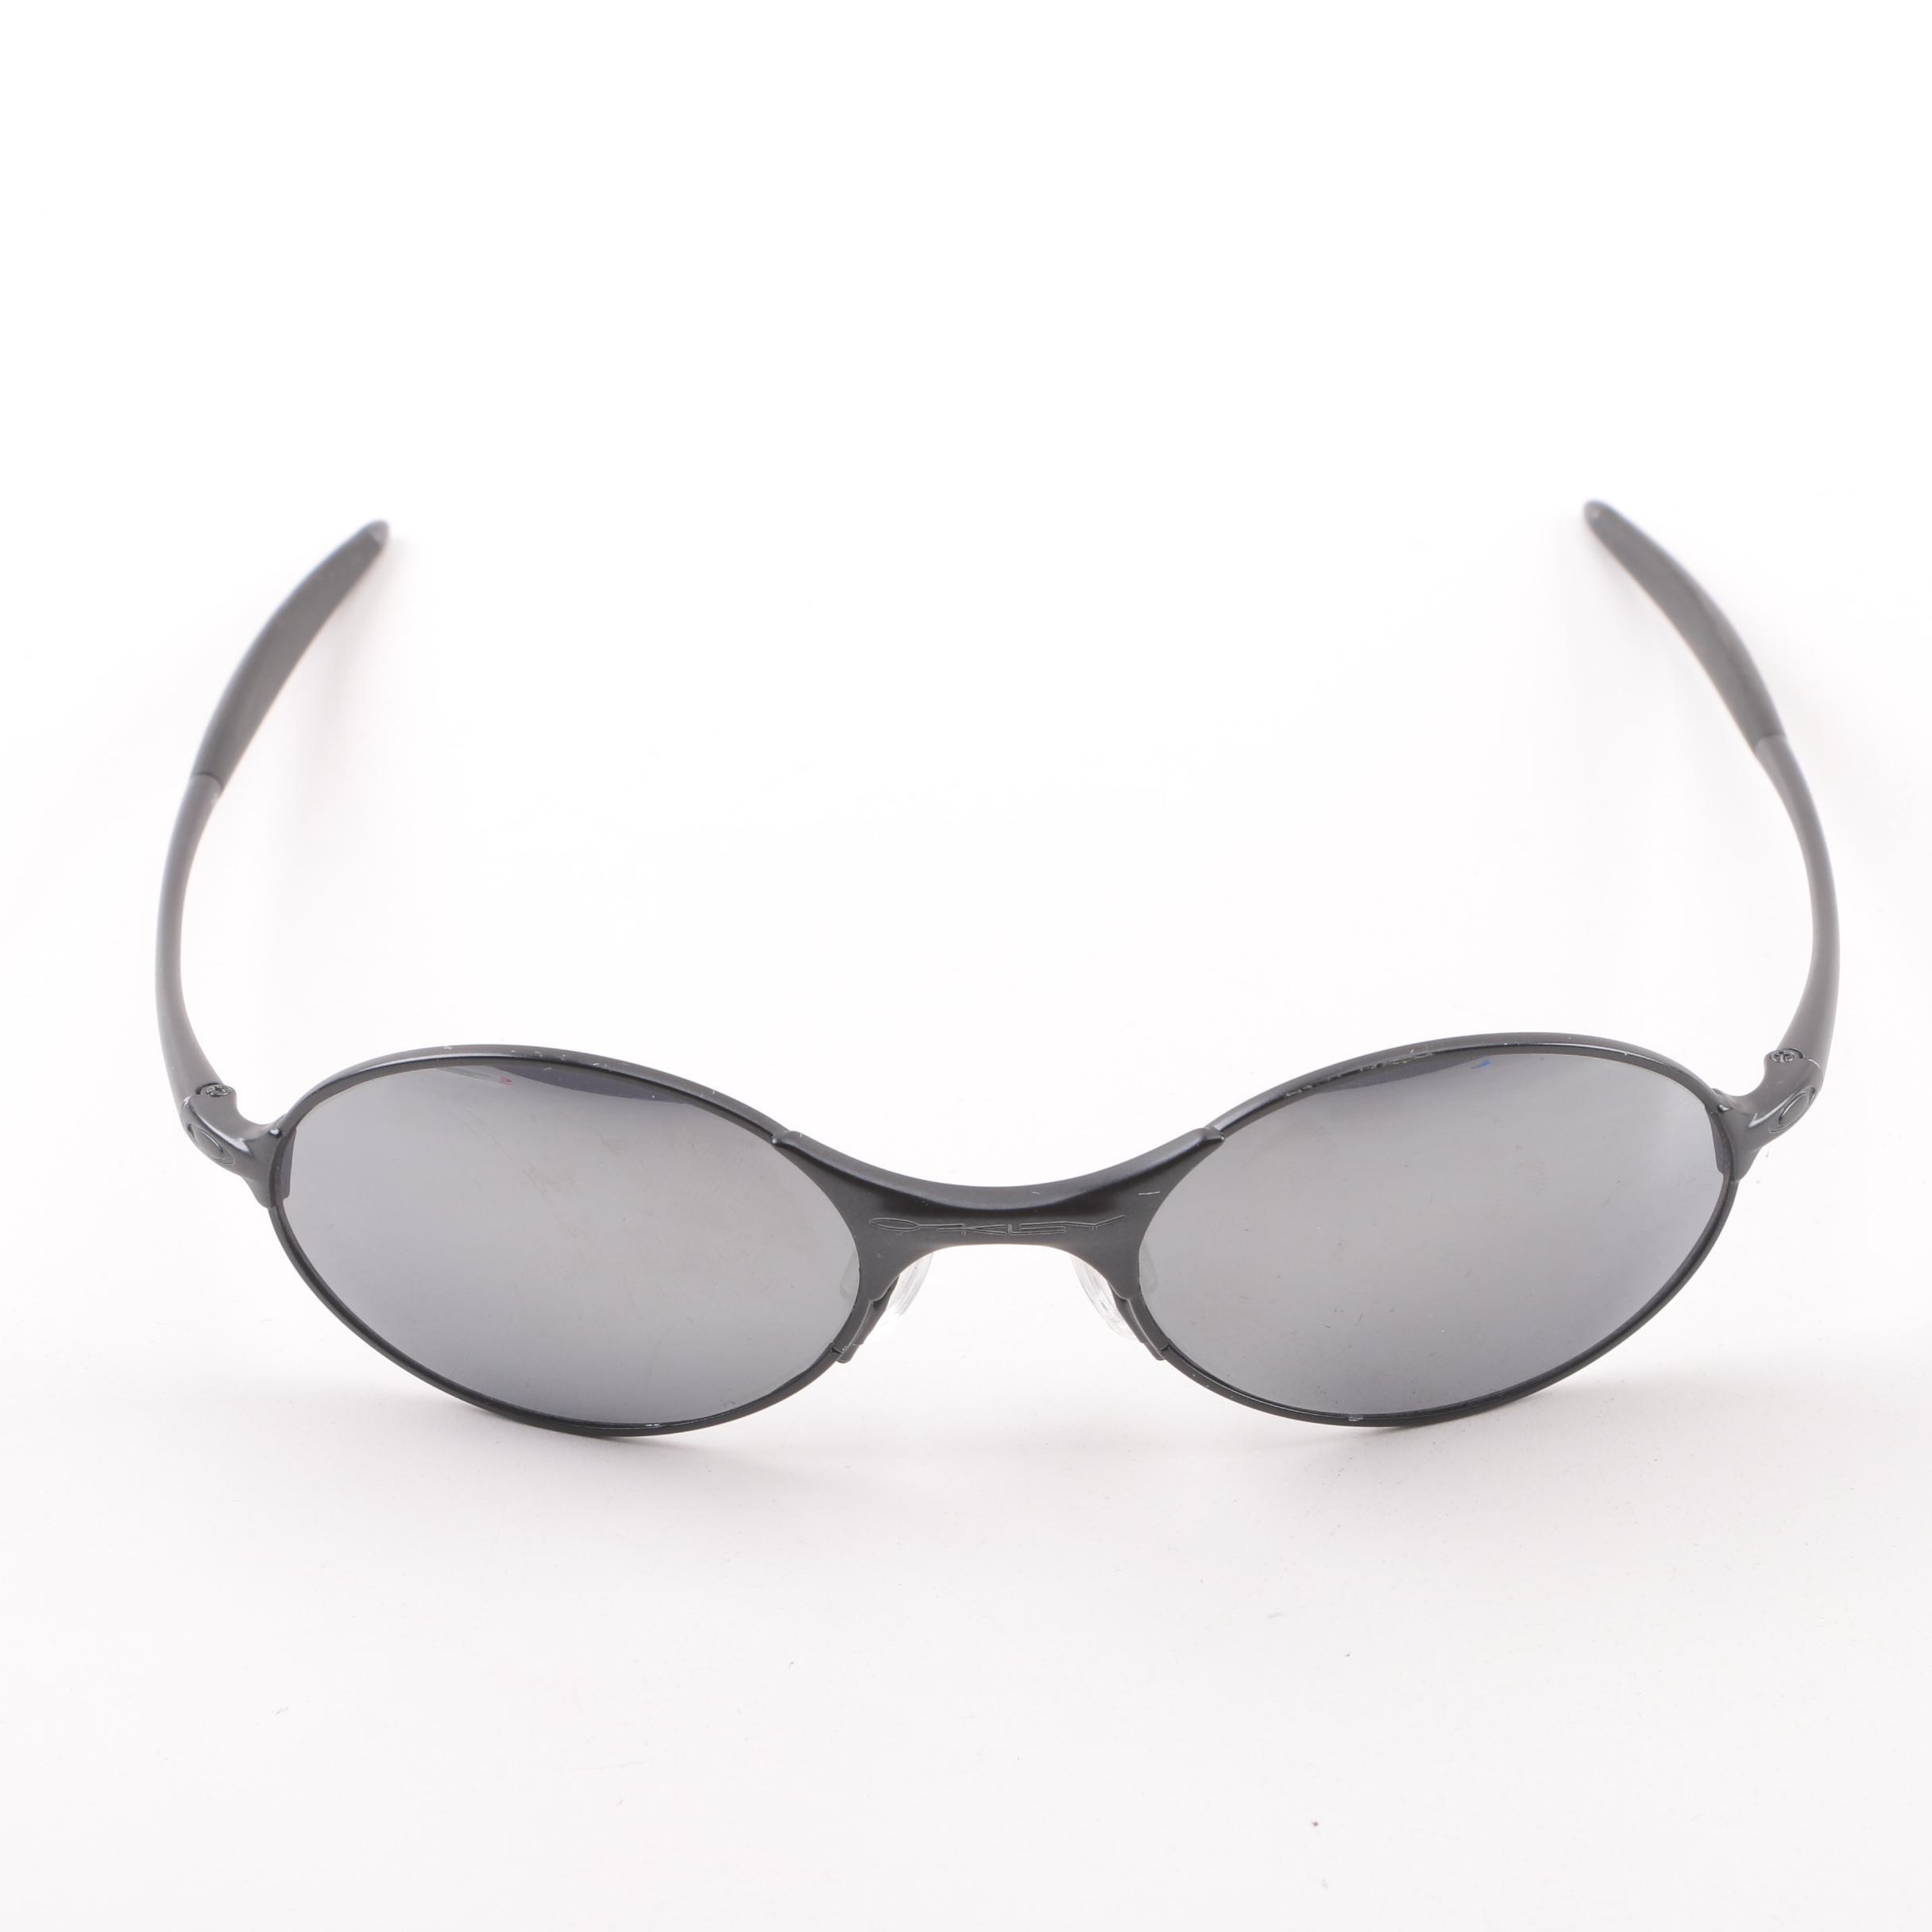 Oakley Black Oval Sport Style Sunglasses